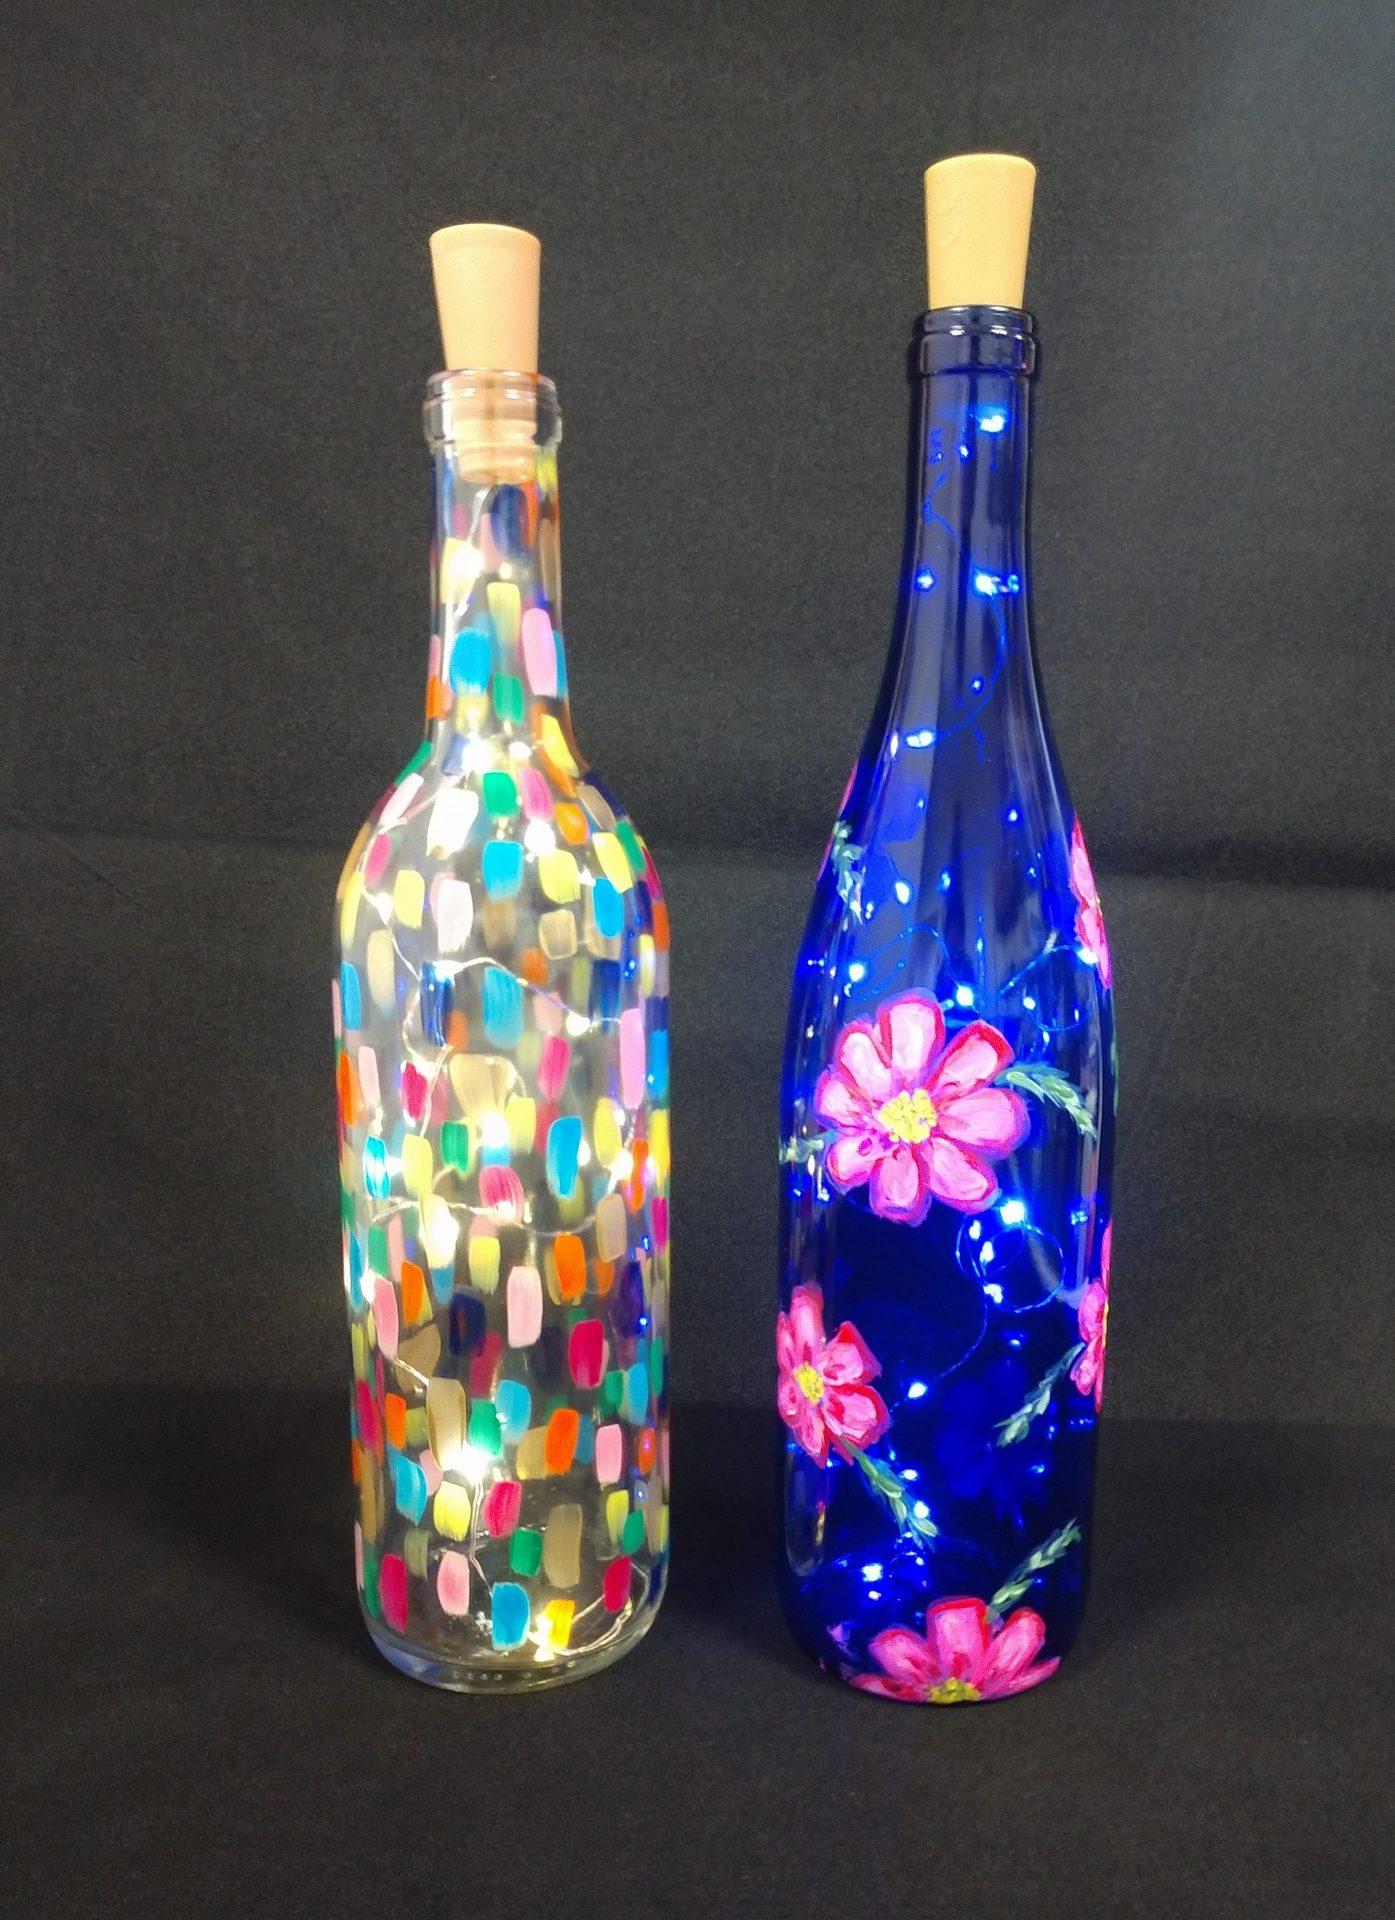 Wine Bottle Painting Materials Visarts